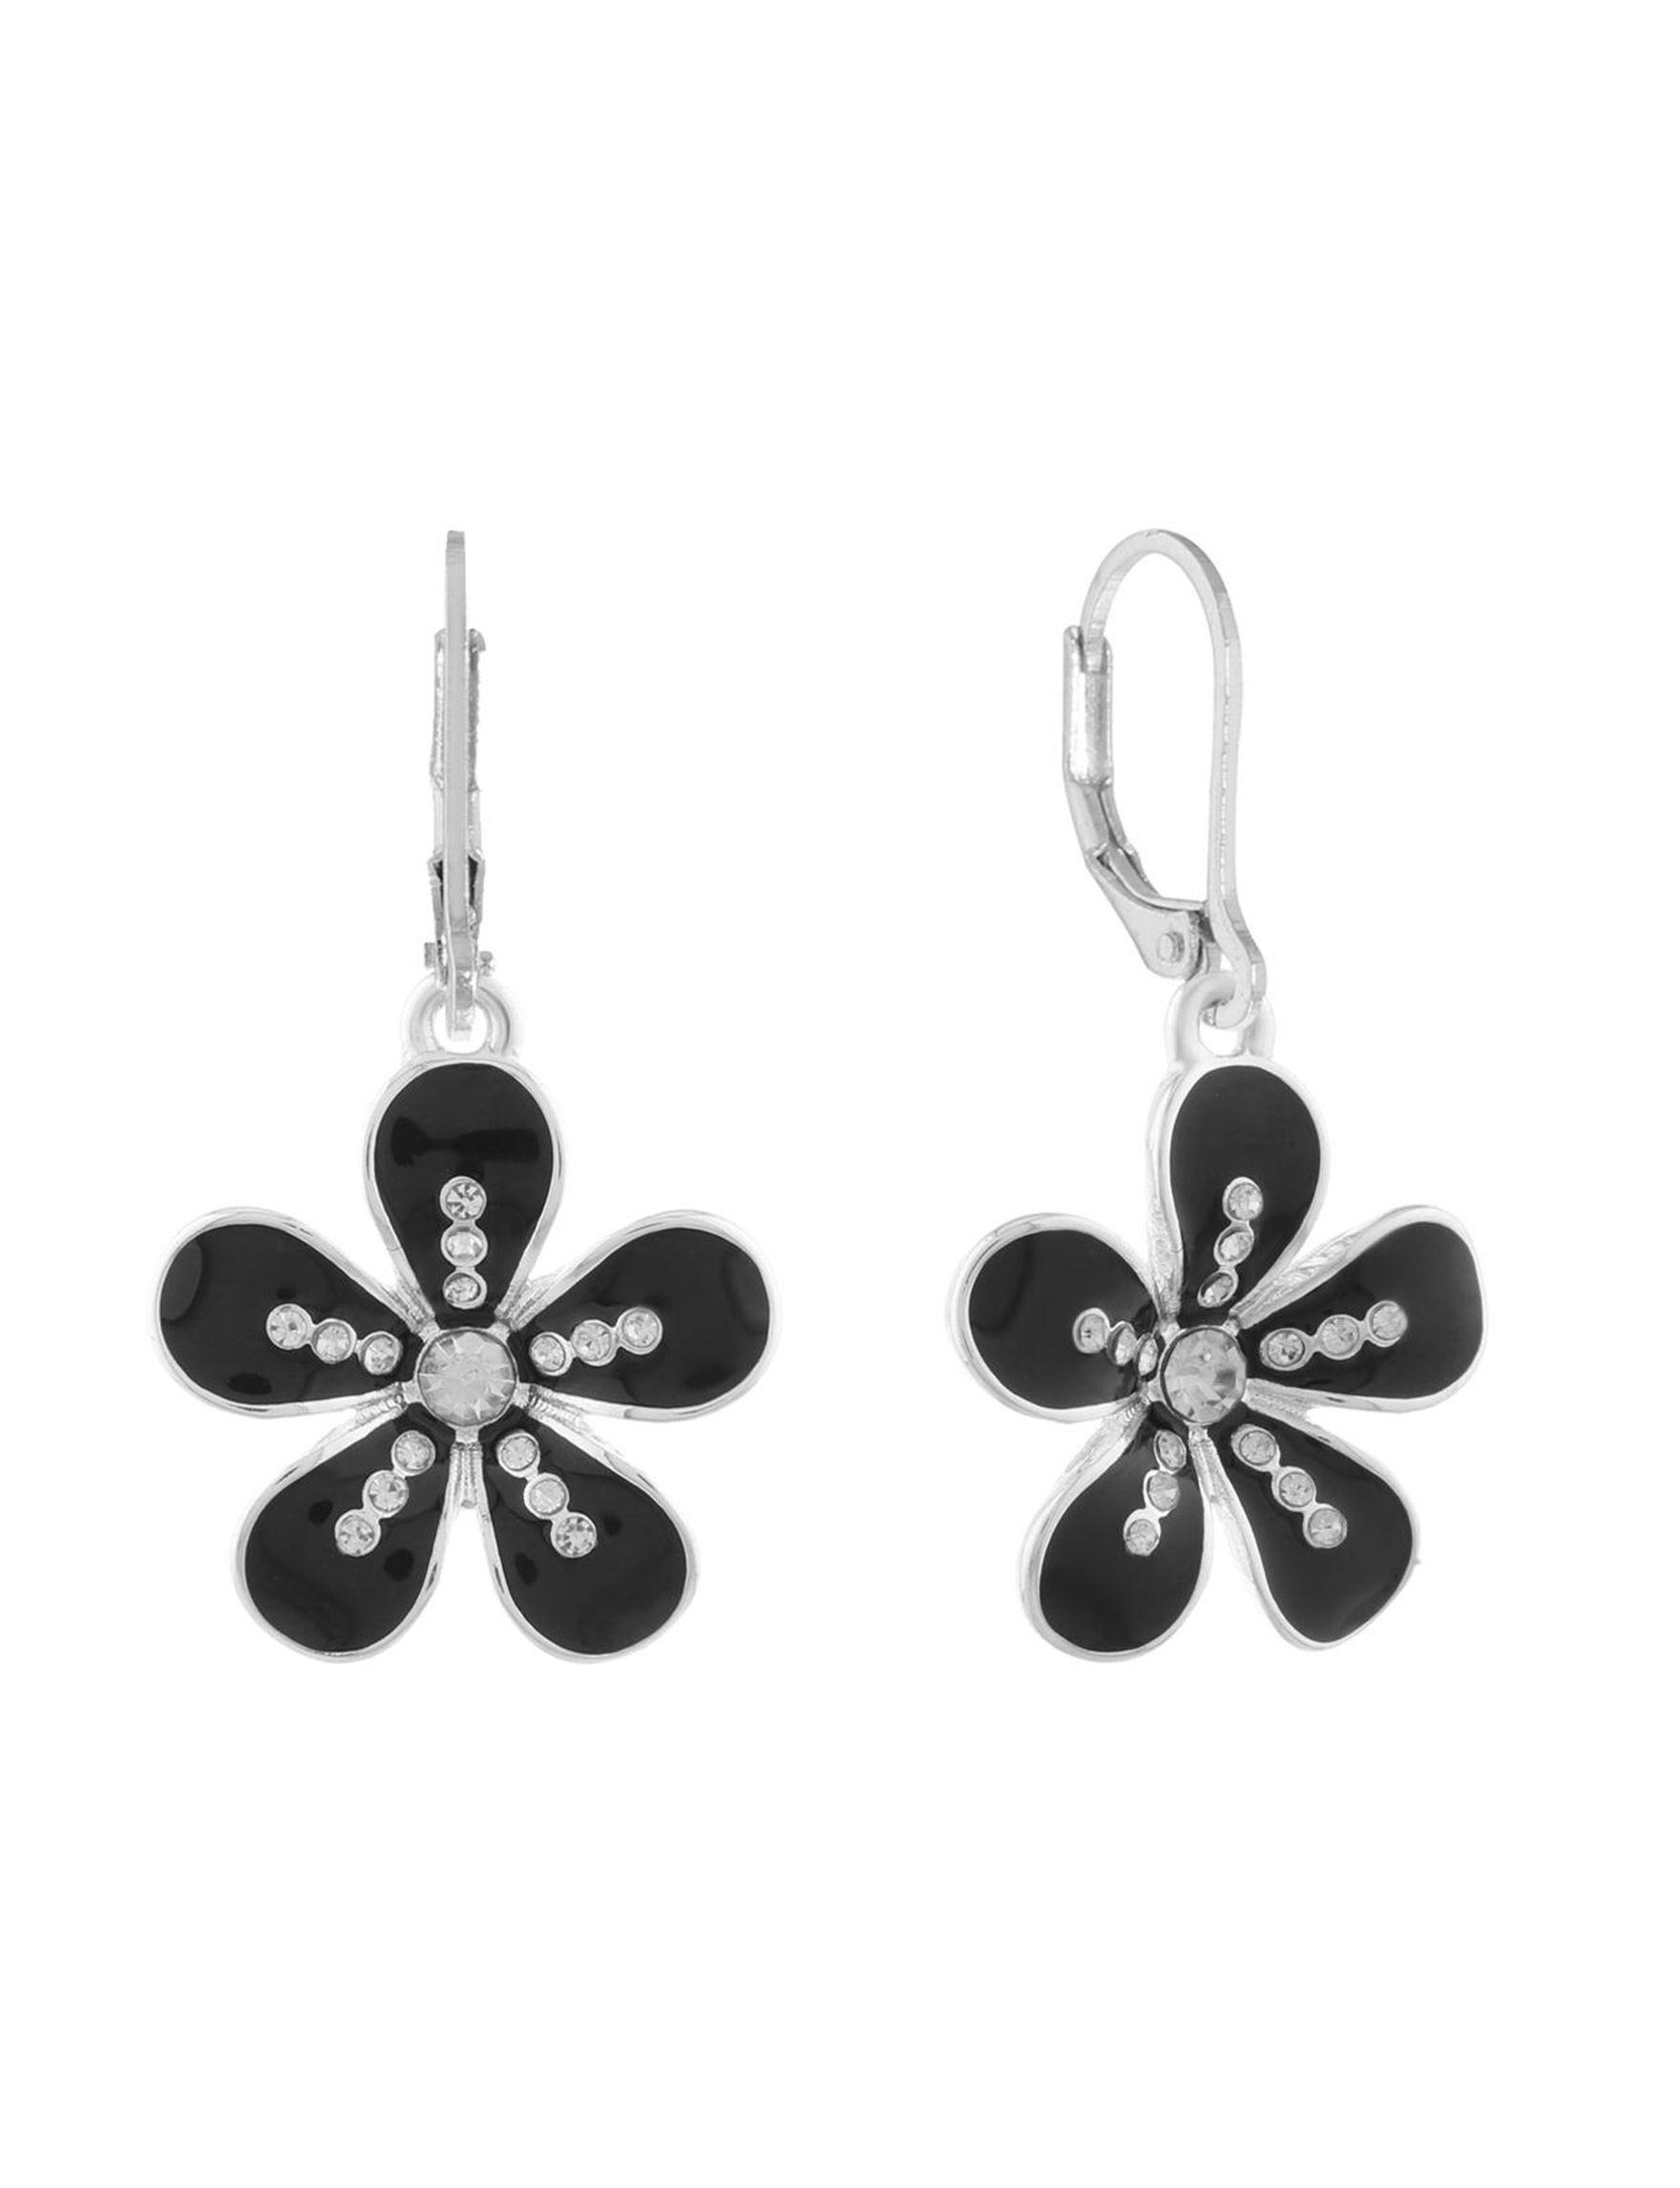 Gloria Vanderbilt Black / Silver Drops Earrings Fashion Jewelry